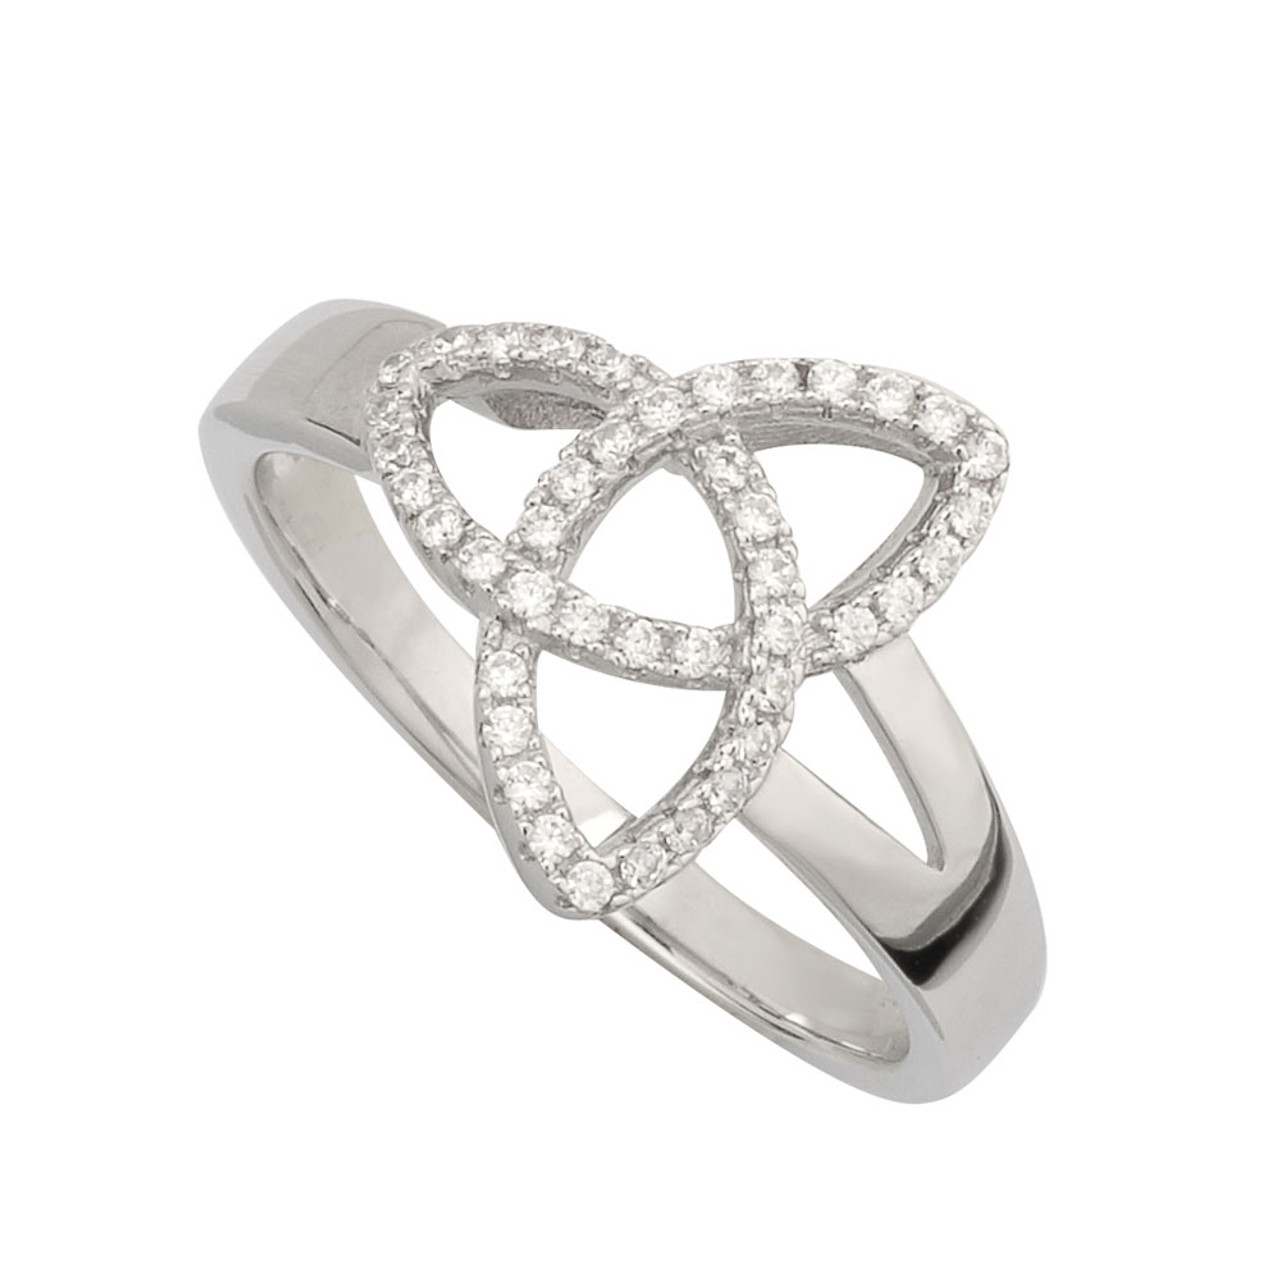 Iirsh Celtic Trinity Knot Ring